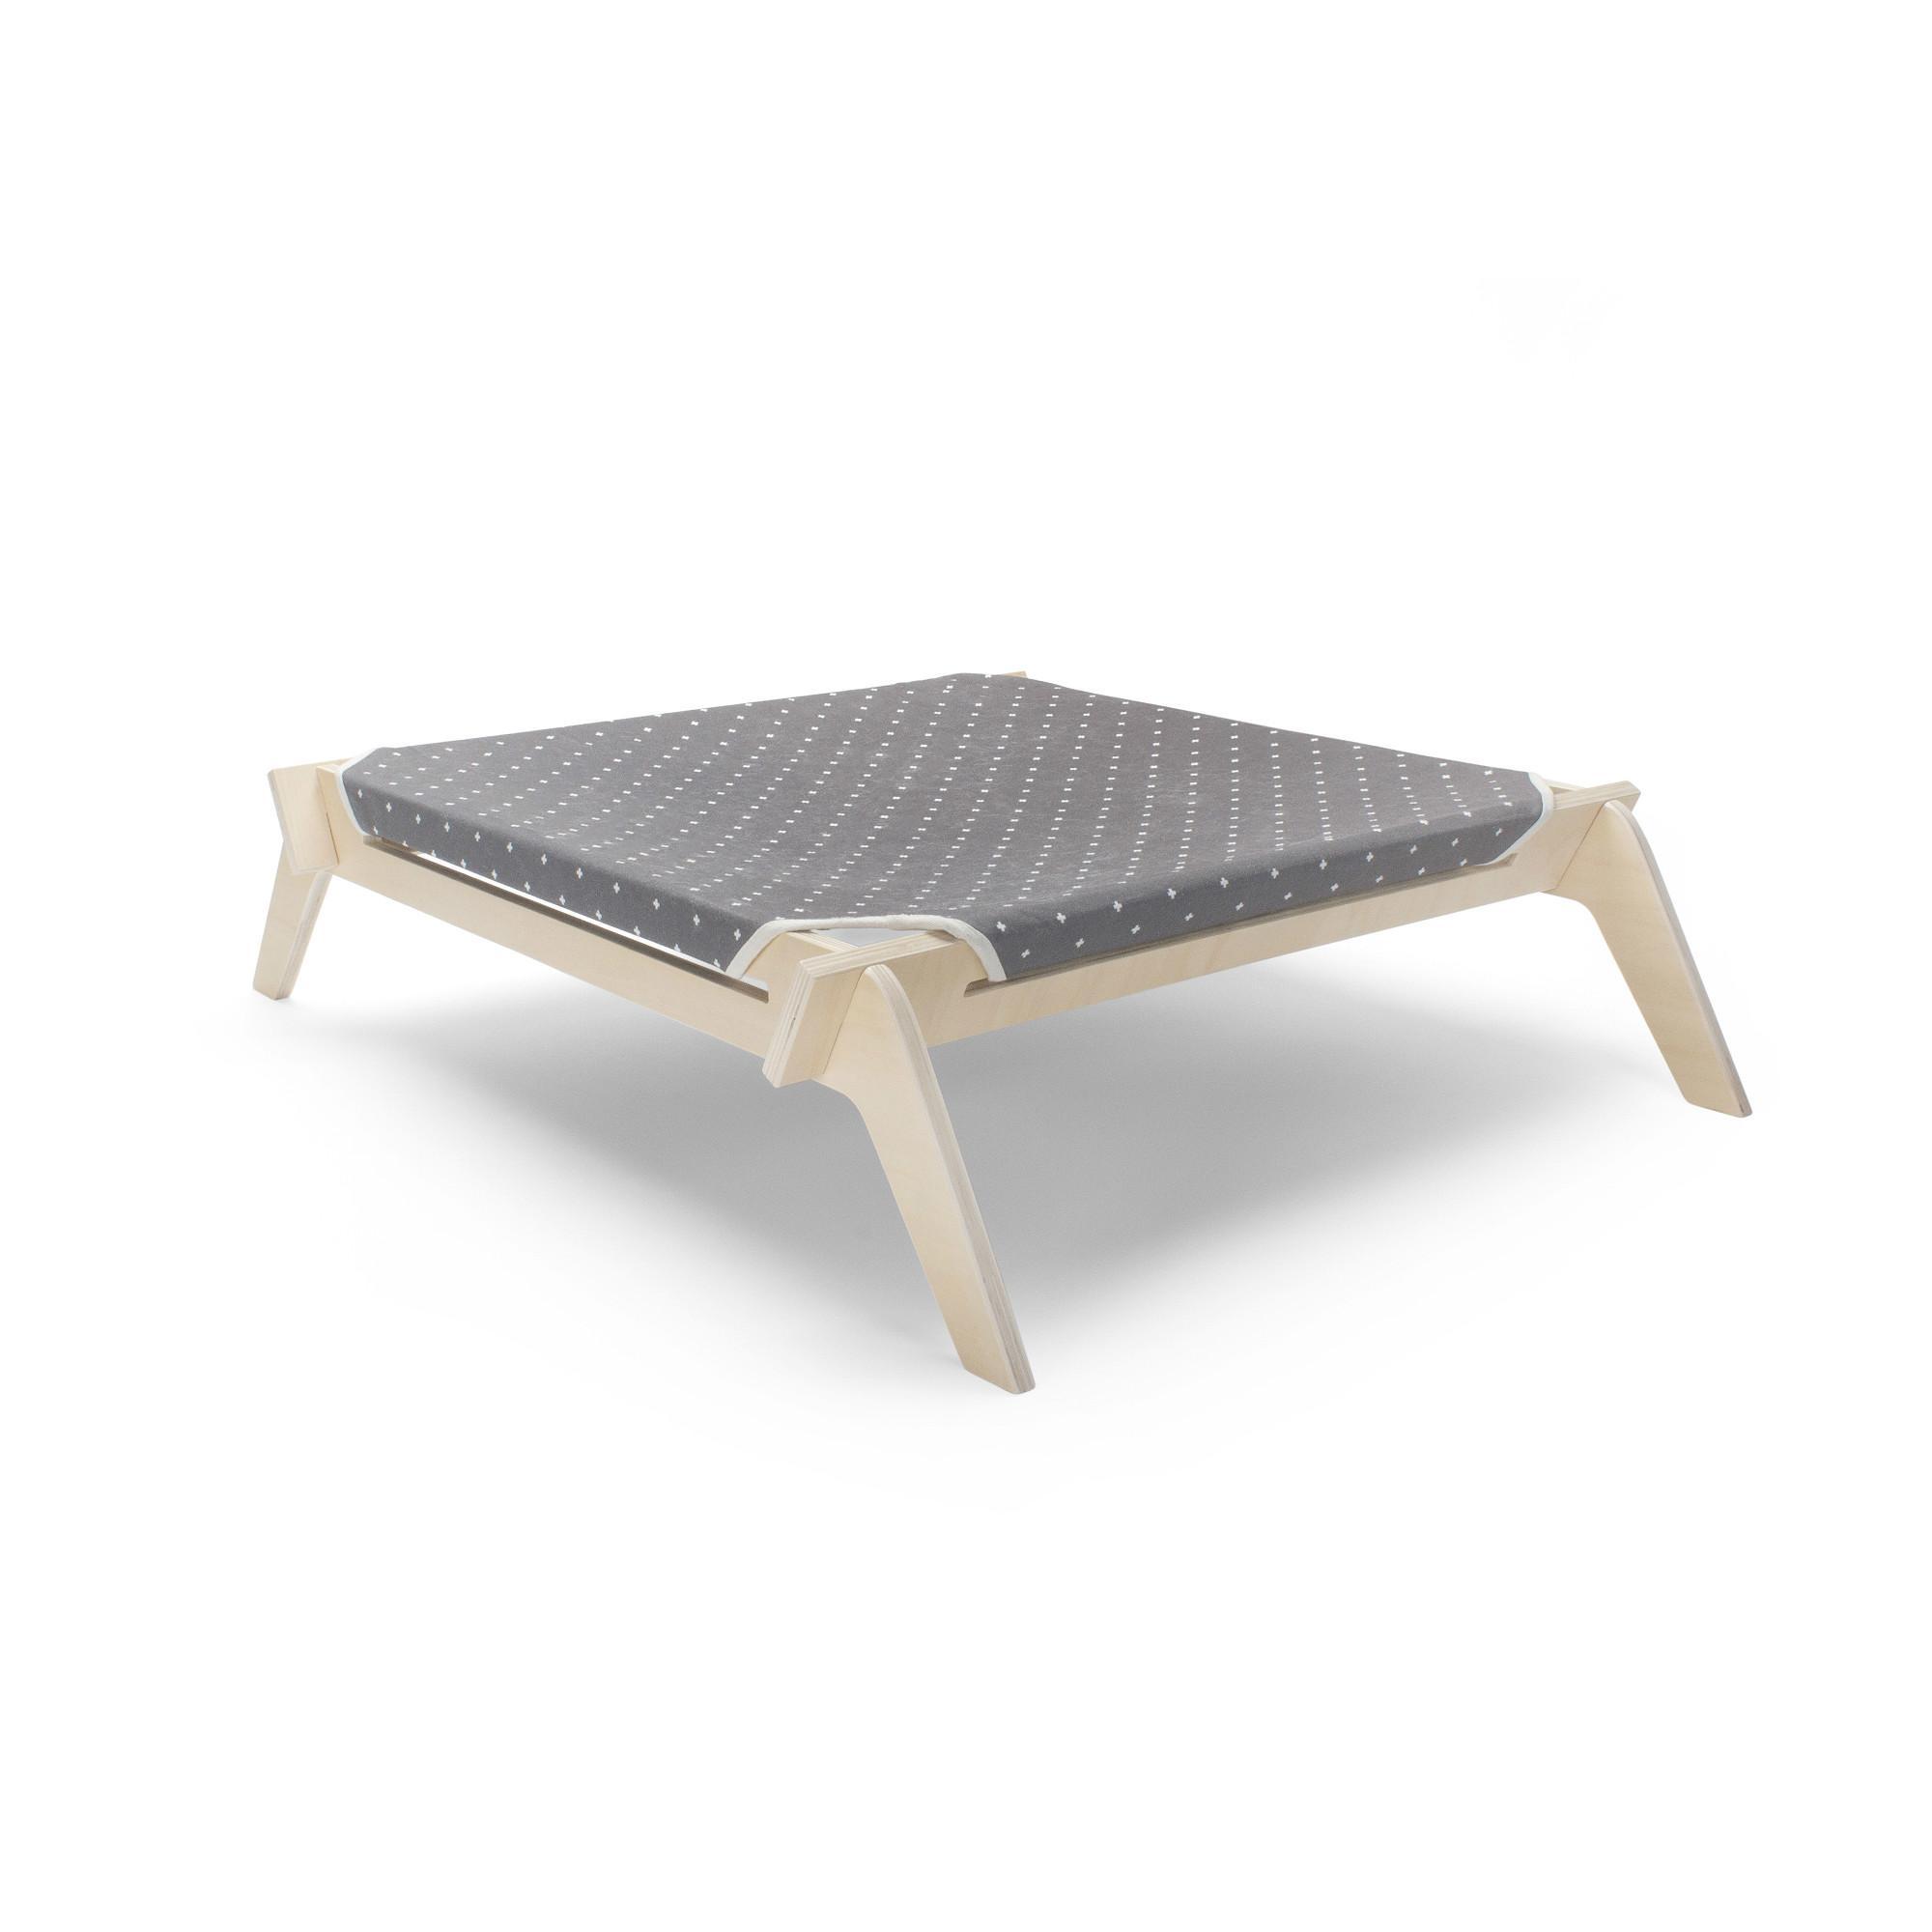 Primetime Petz Reversible Designer Dog Lounge - Gray/Neutral